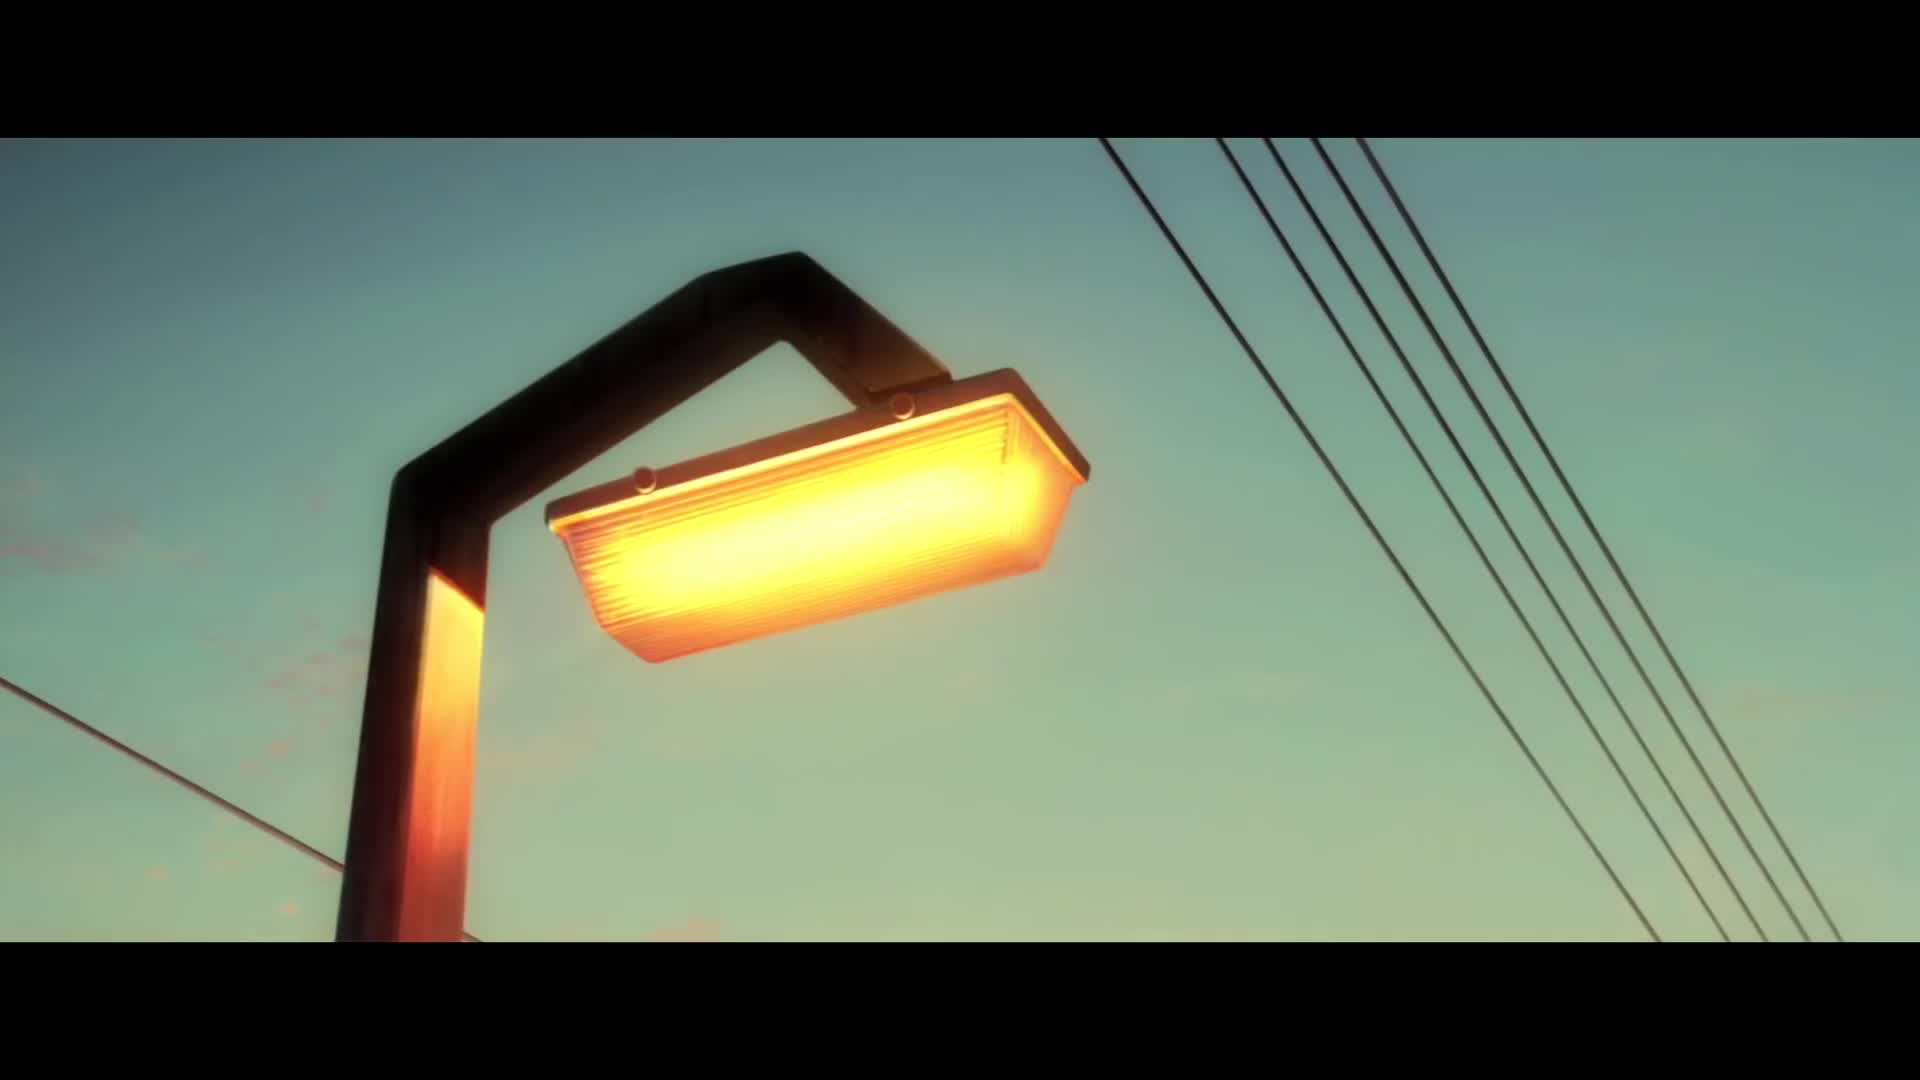 Violet Evergarden Film Release Indefinitely Postponed [HD] screen capture